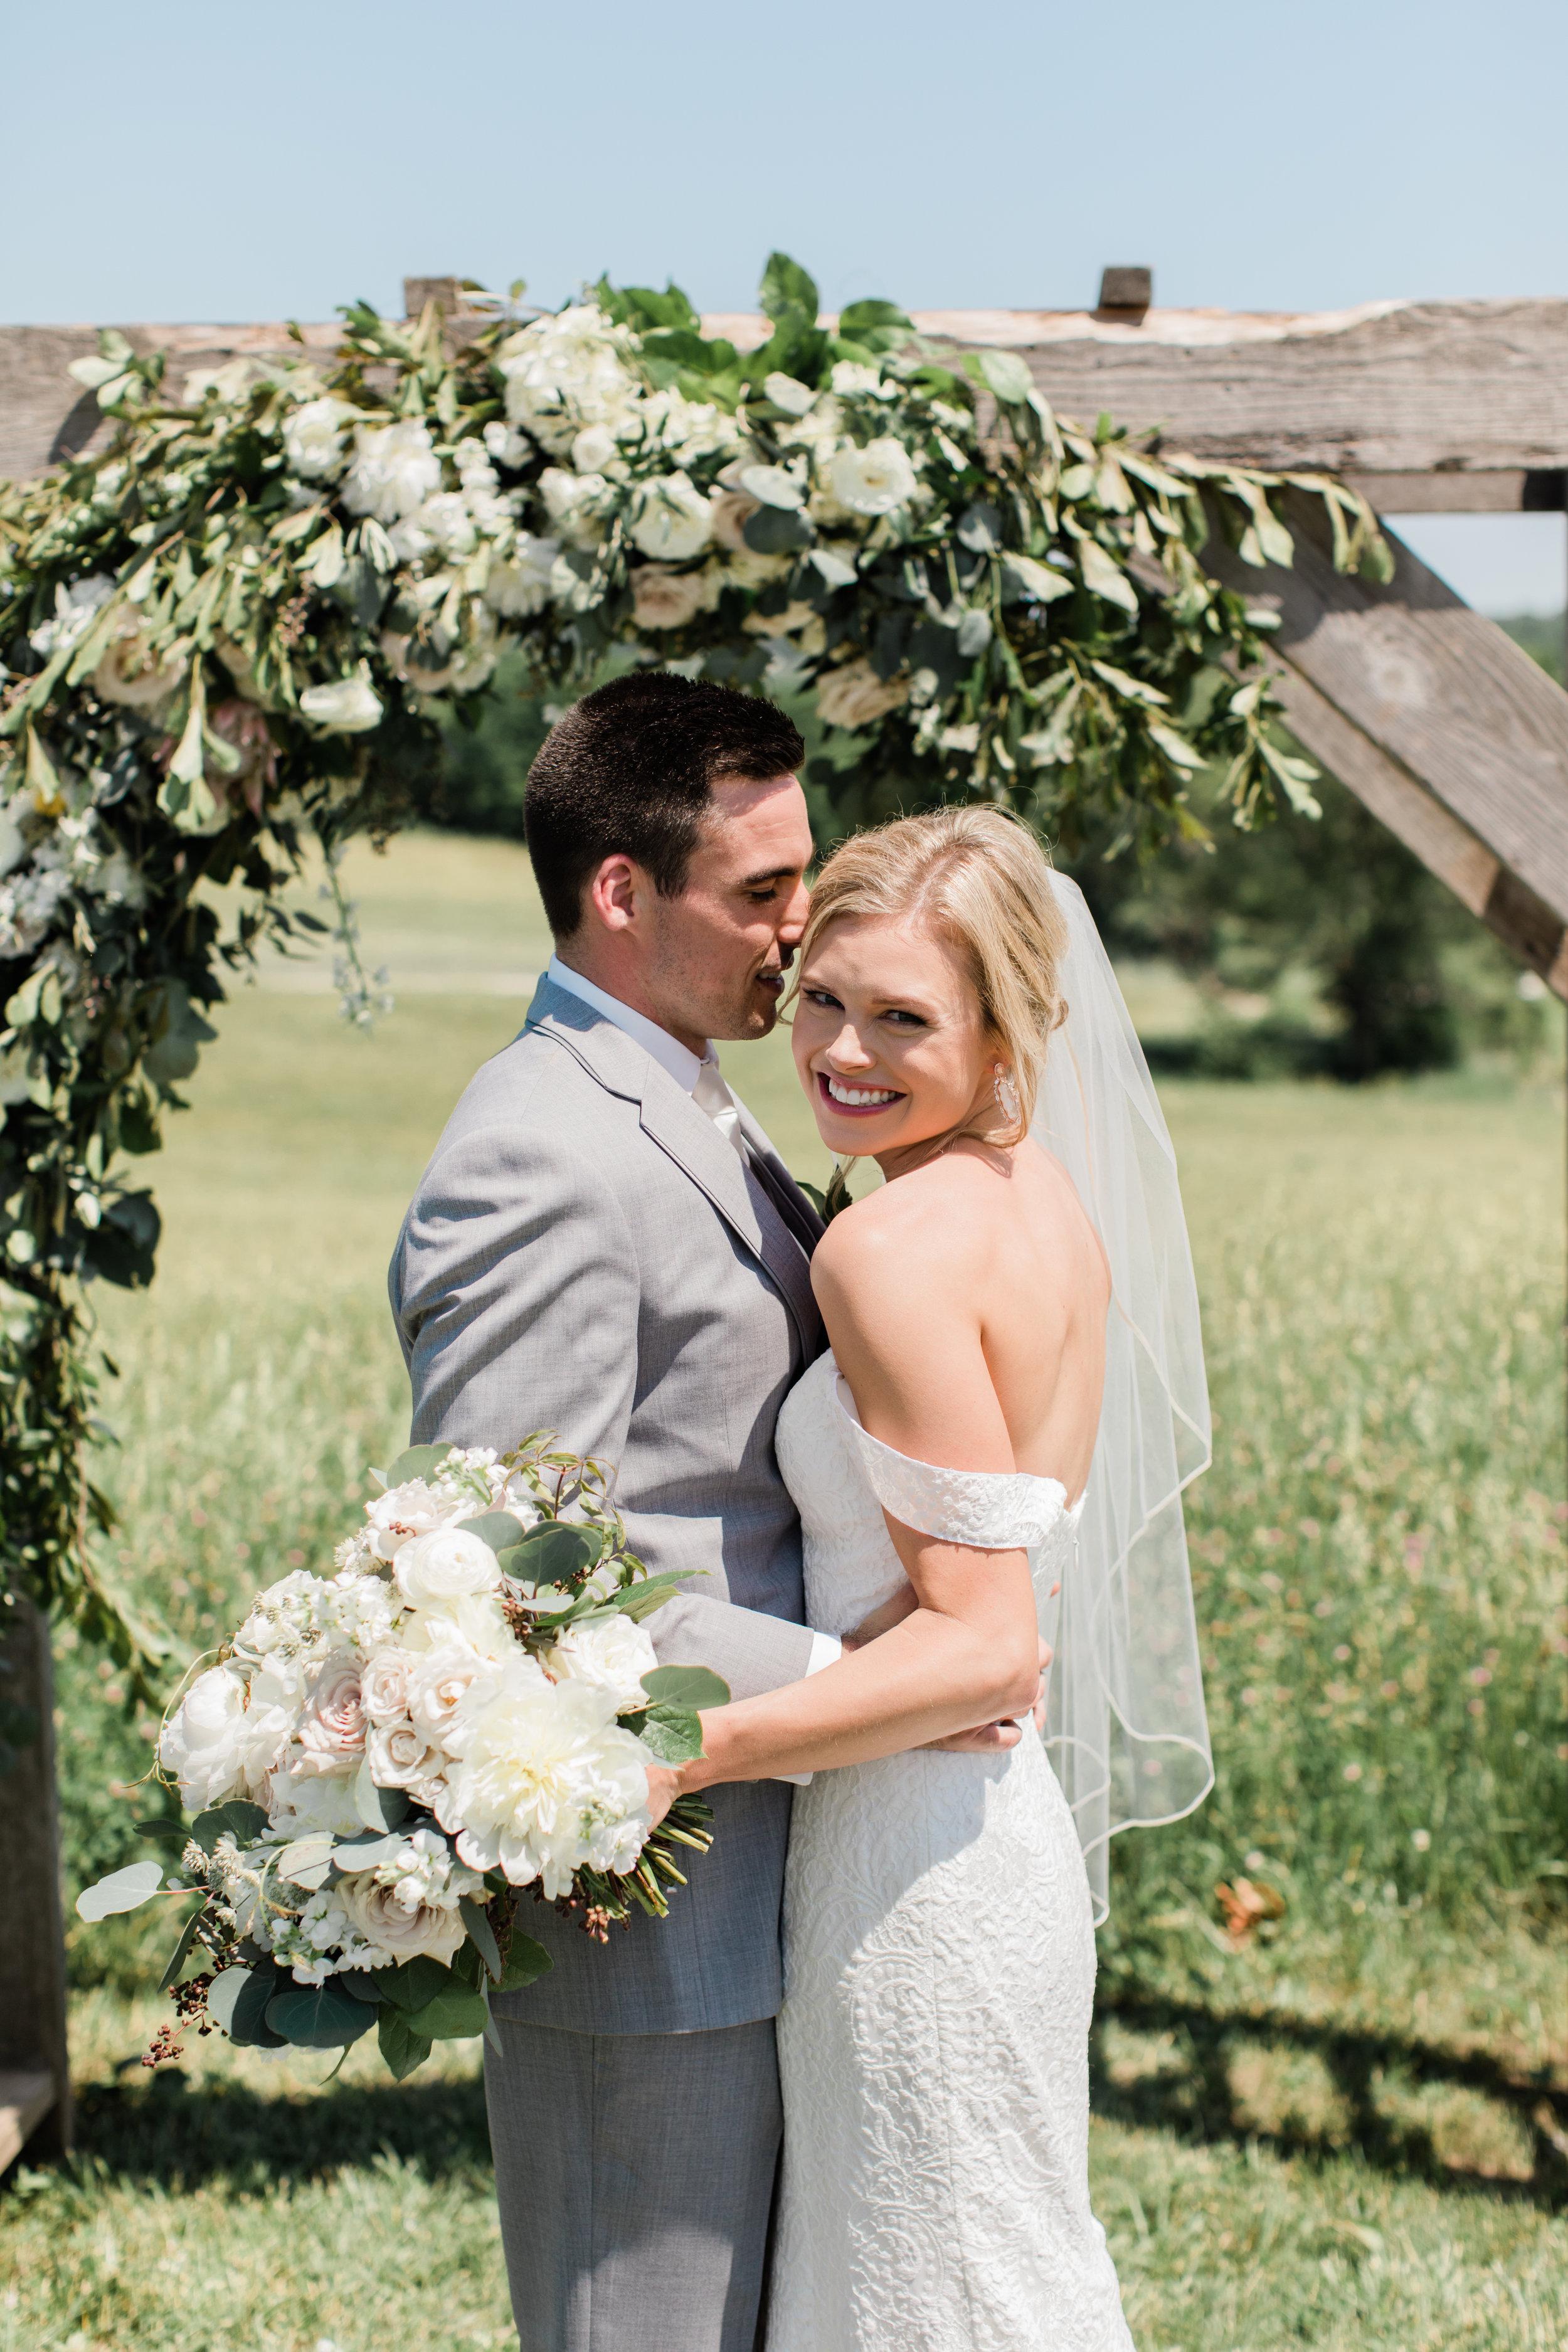 RHODES WEDDING - MARISSA CRIBBS PHOTOGRAPHY-177.jpg